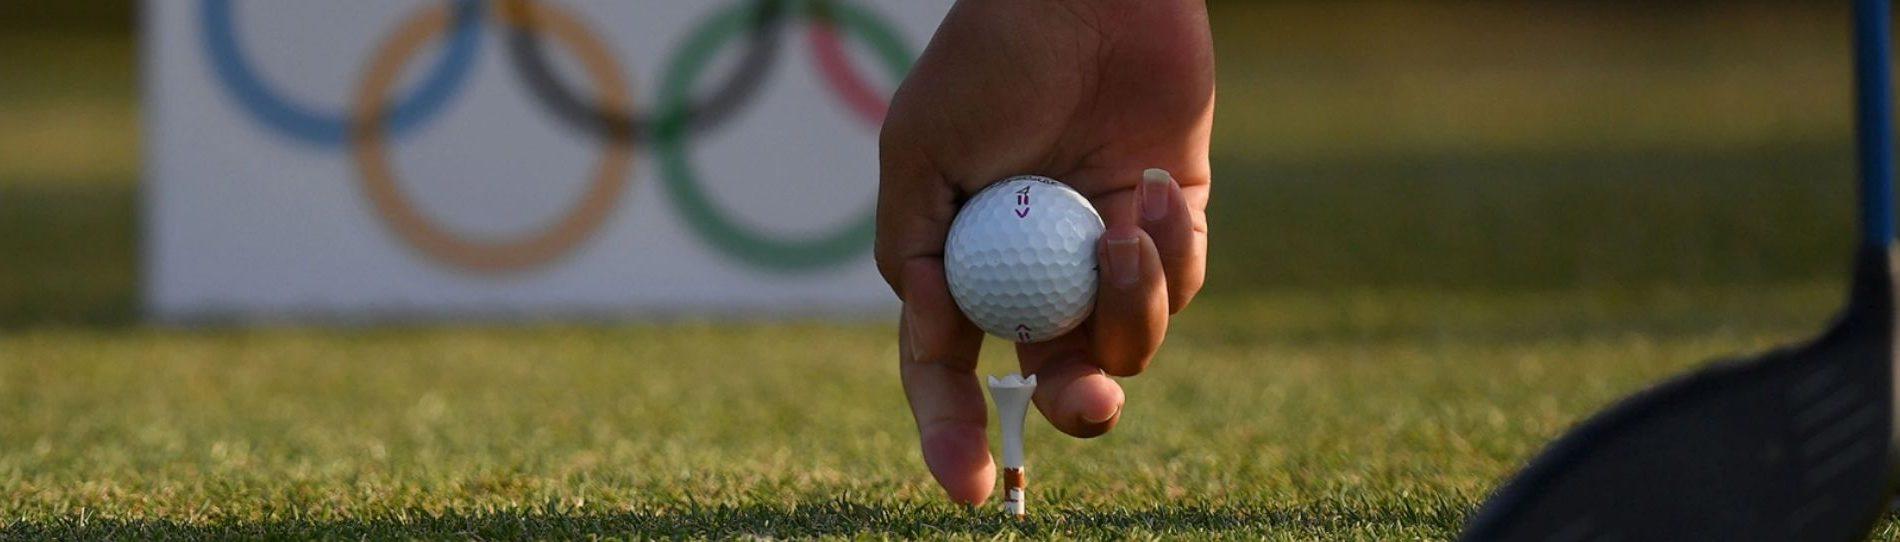 golf at the tokyo olympics